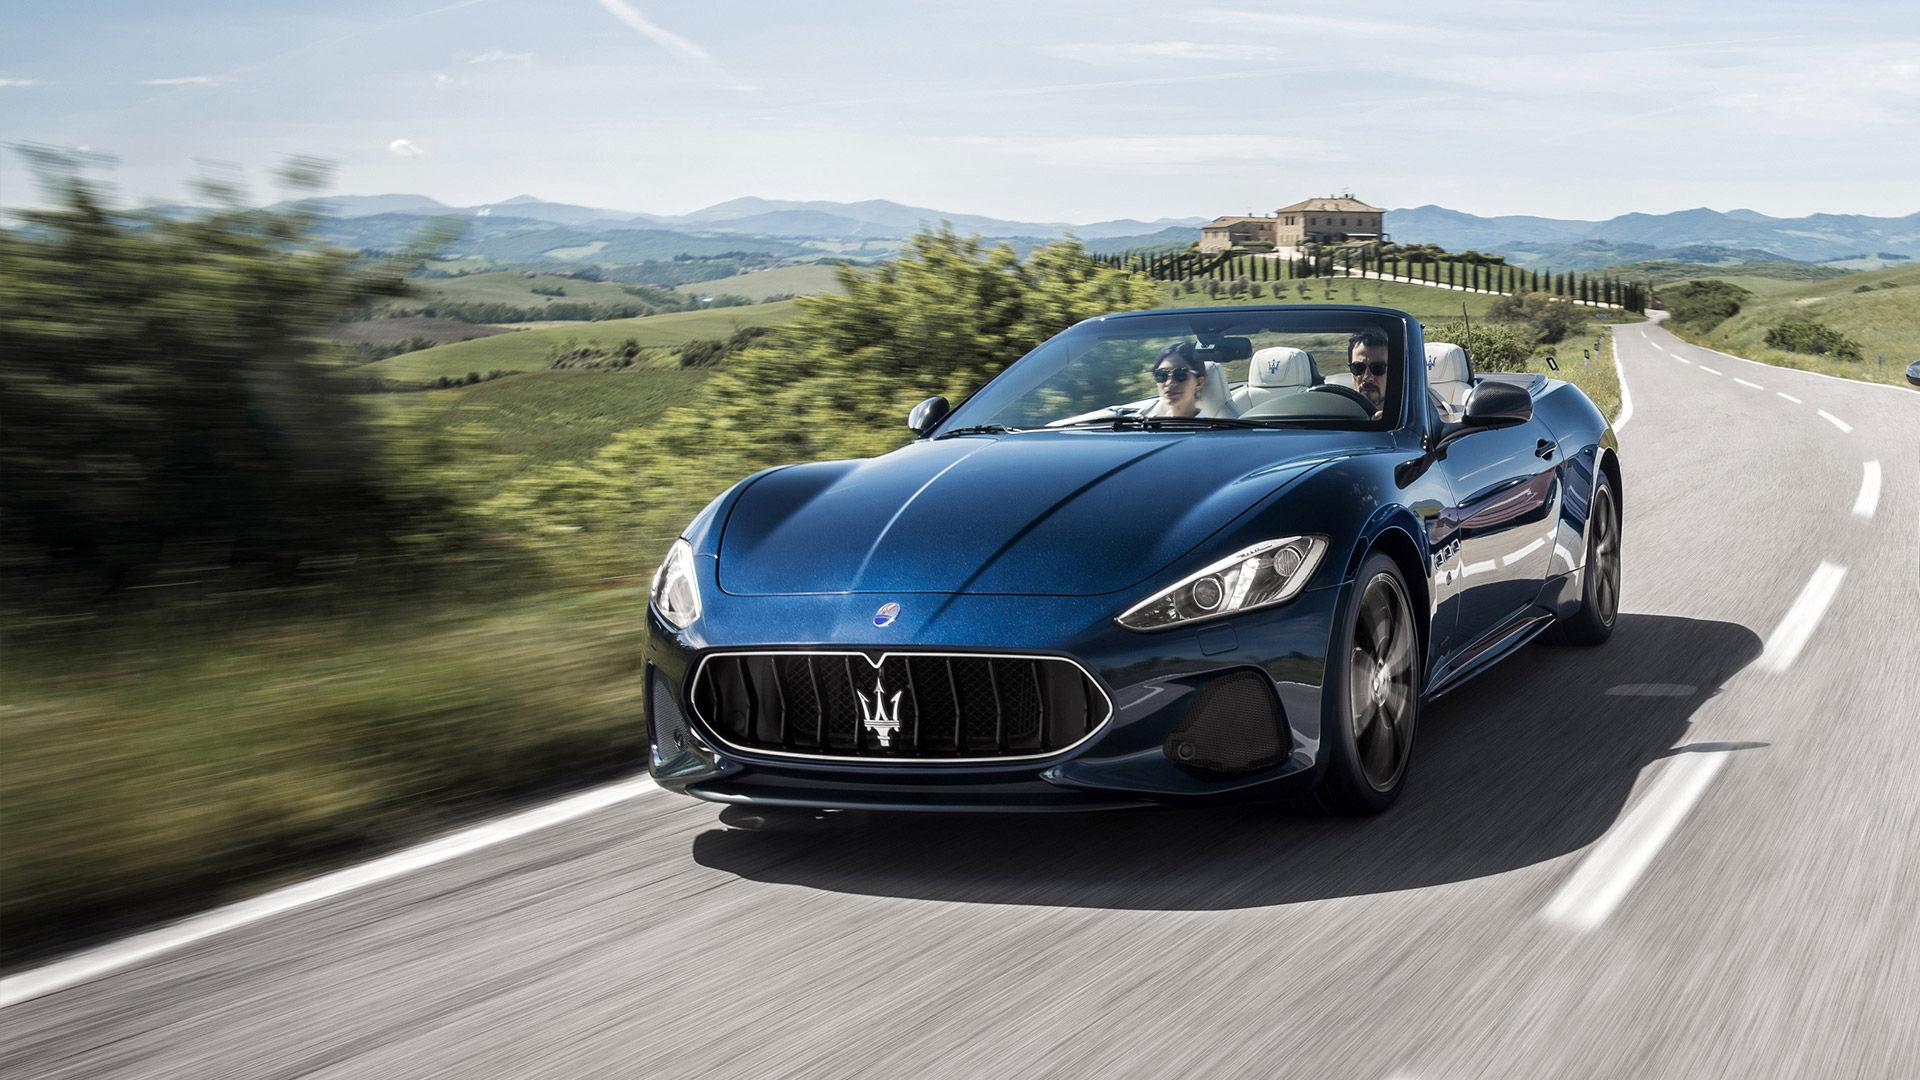 Maserati GranTurismo Sport MC Cabriolet 2018 - carrosserie bleue - vue latérale - essai routier